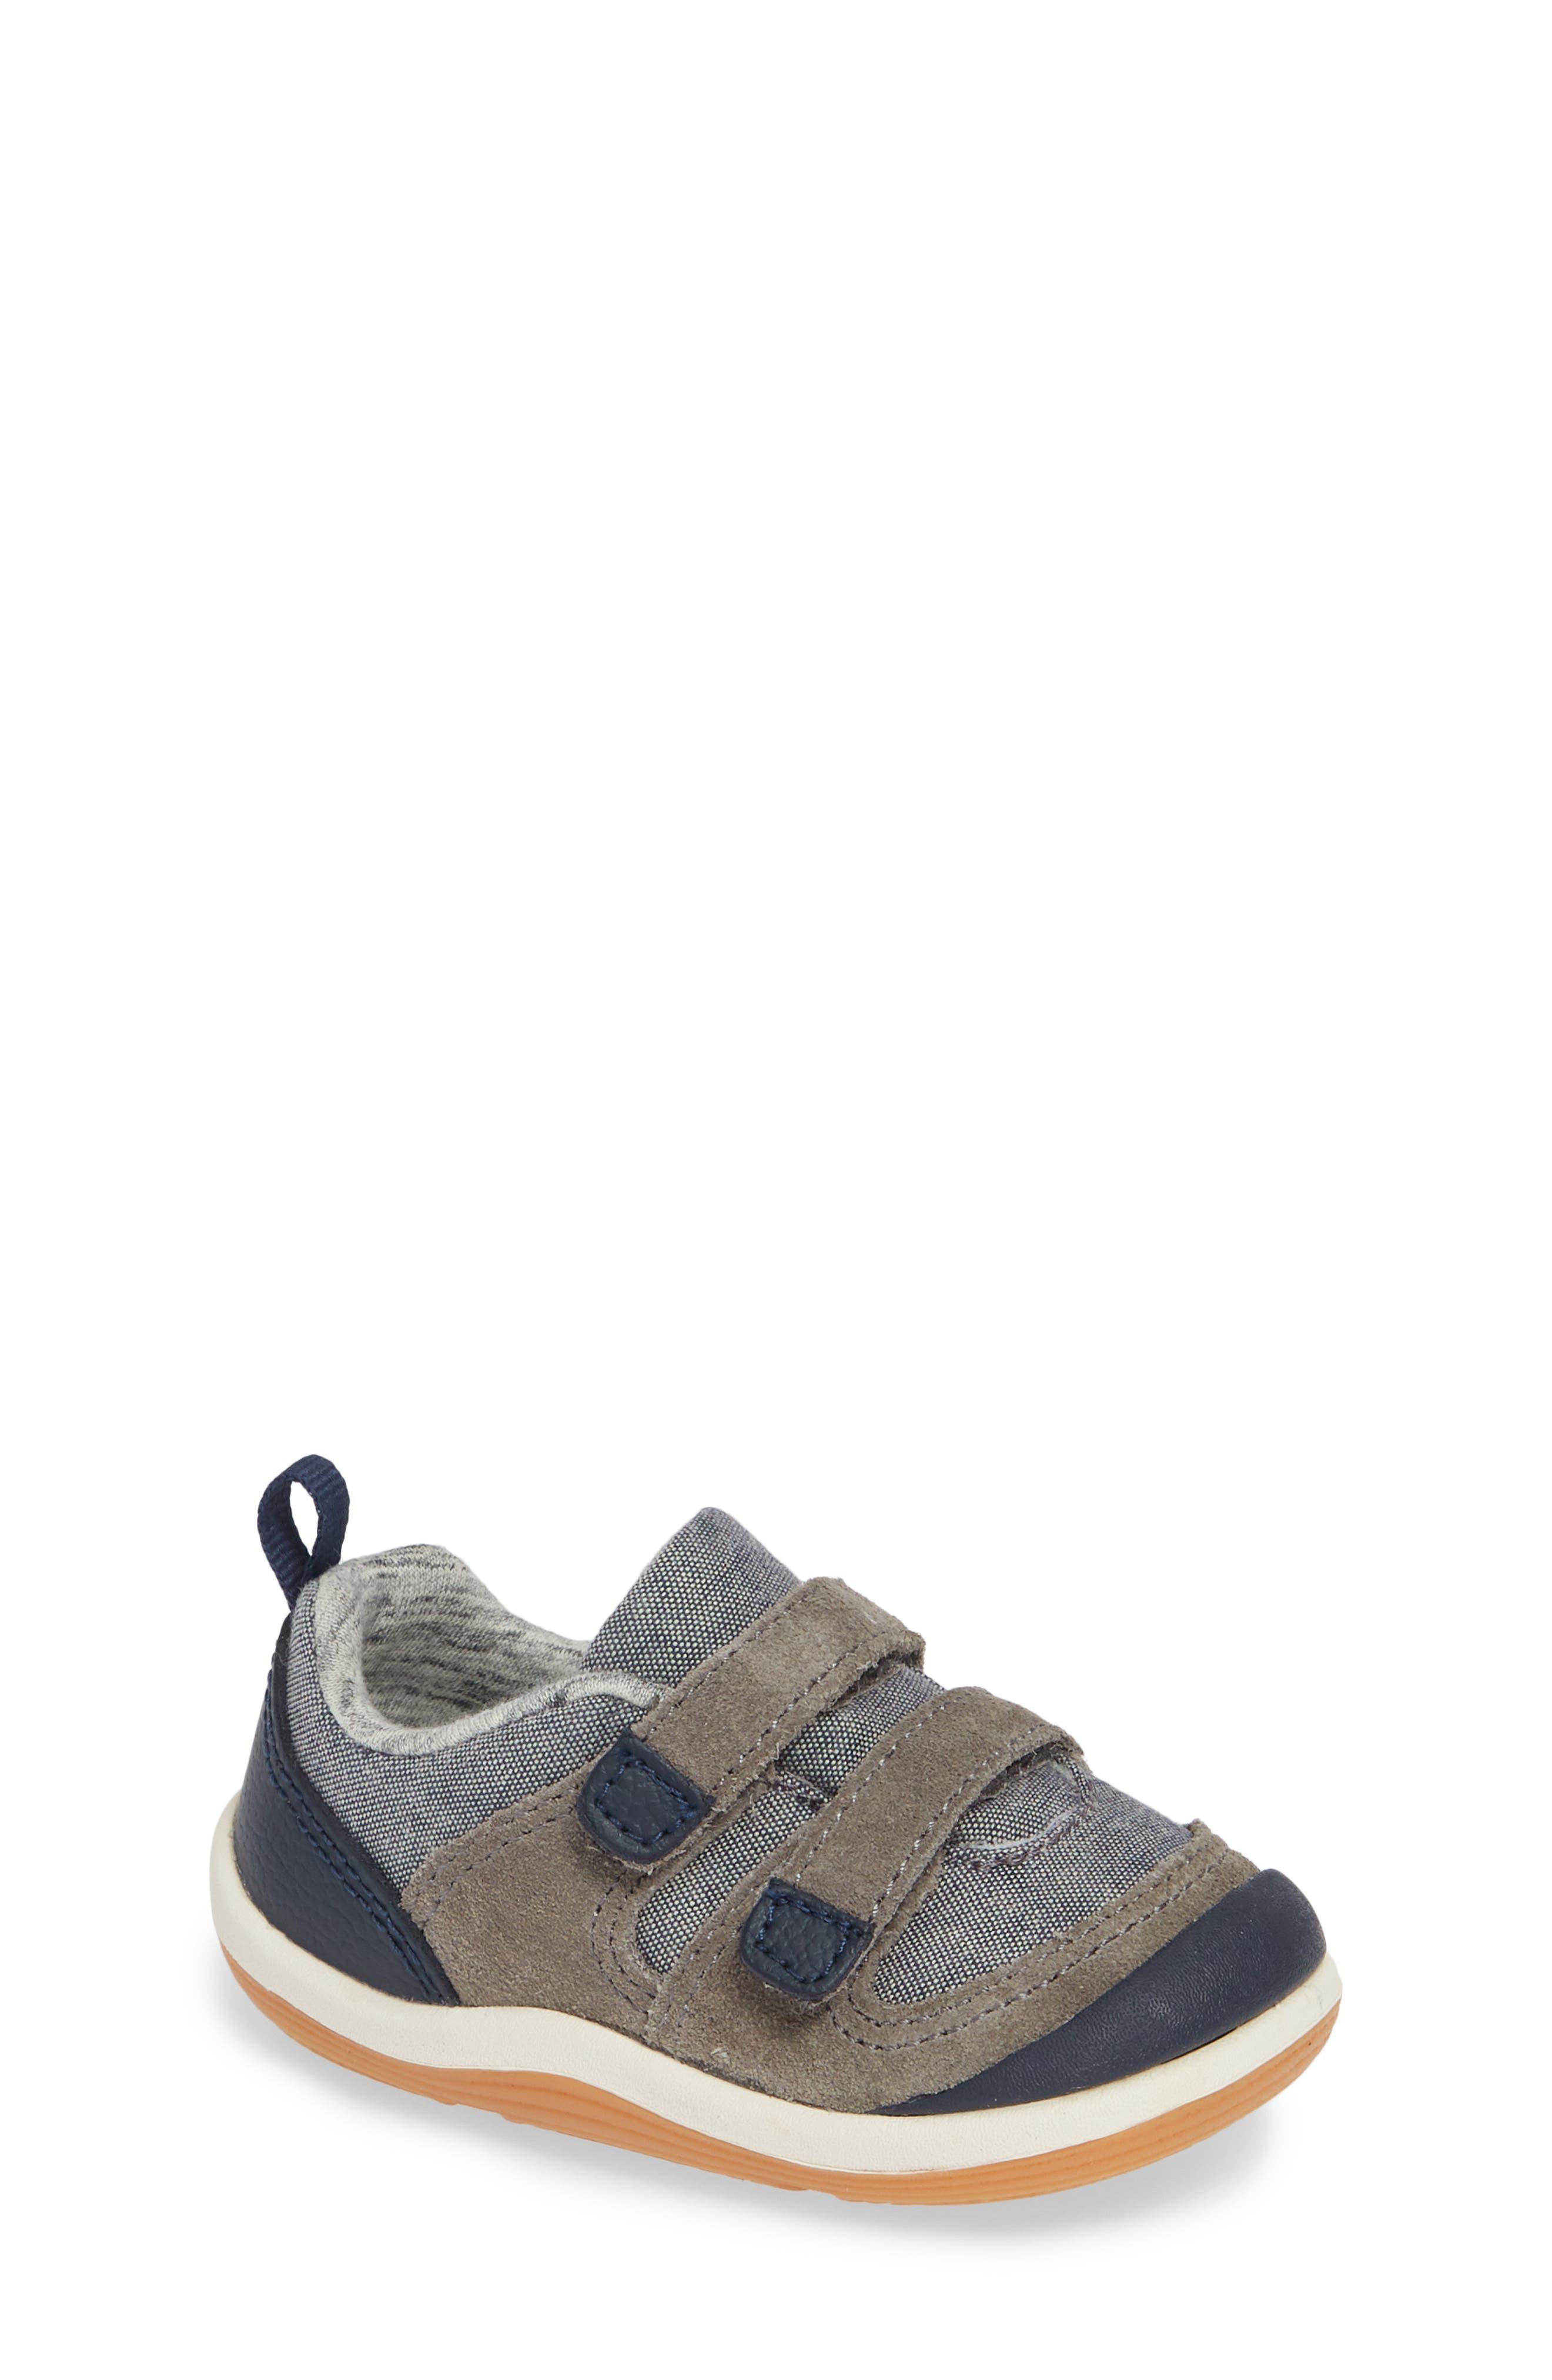 Kieran Sneaker,                             Main thumbnail 1, color,                             410